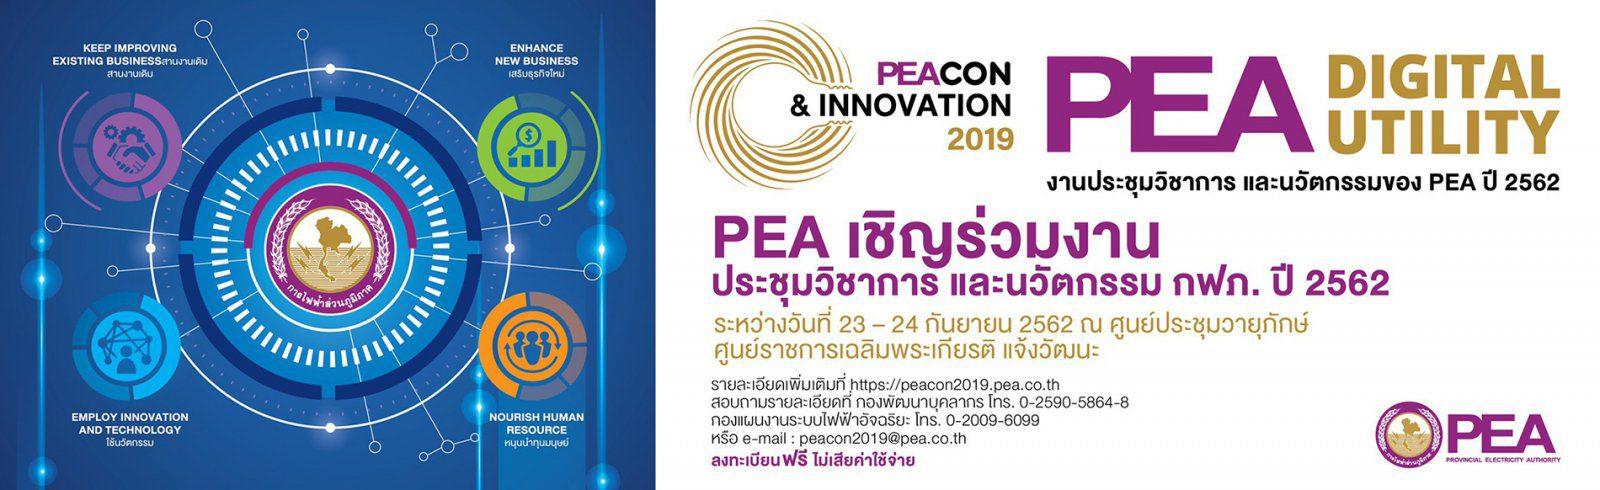 PEA เชิญร่วมงาน ประชุมวิชาการ และนวัตกรรม กฟภ. ประจำปี 2562  PEACON & Innovation 2019